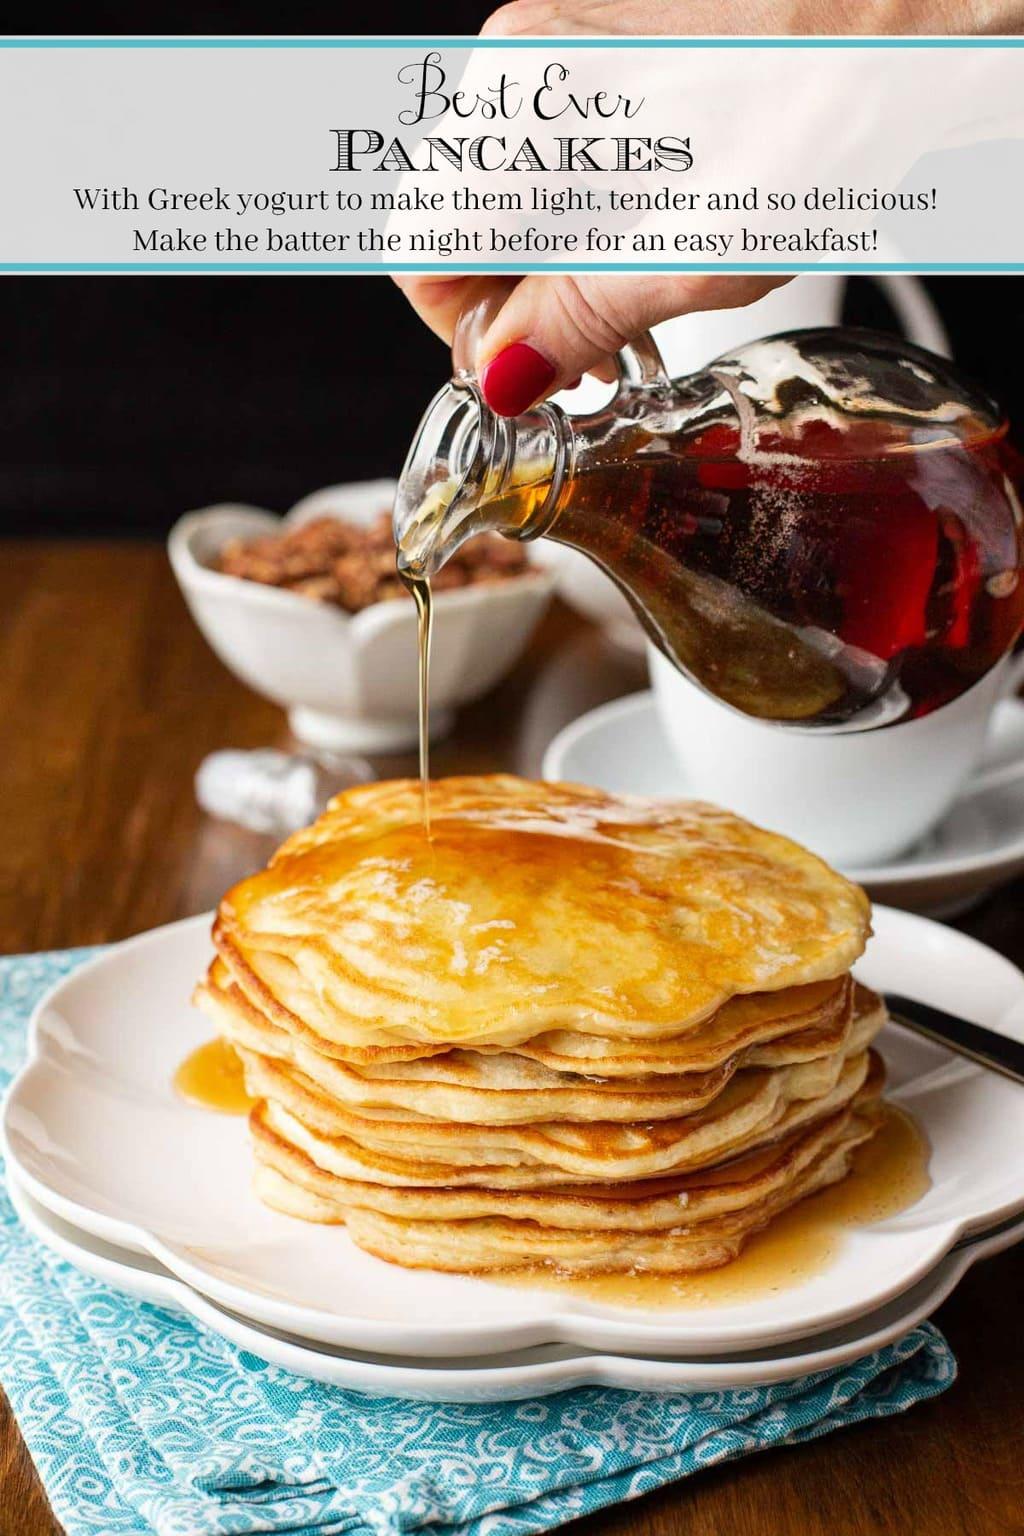 Best Ever Pancakes (with Greek yogurt)